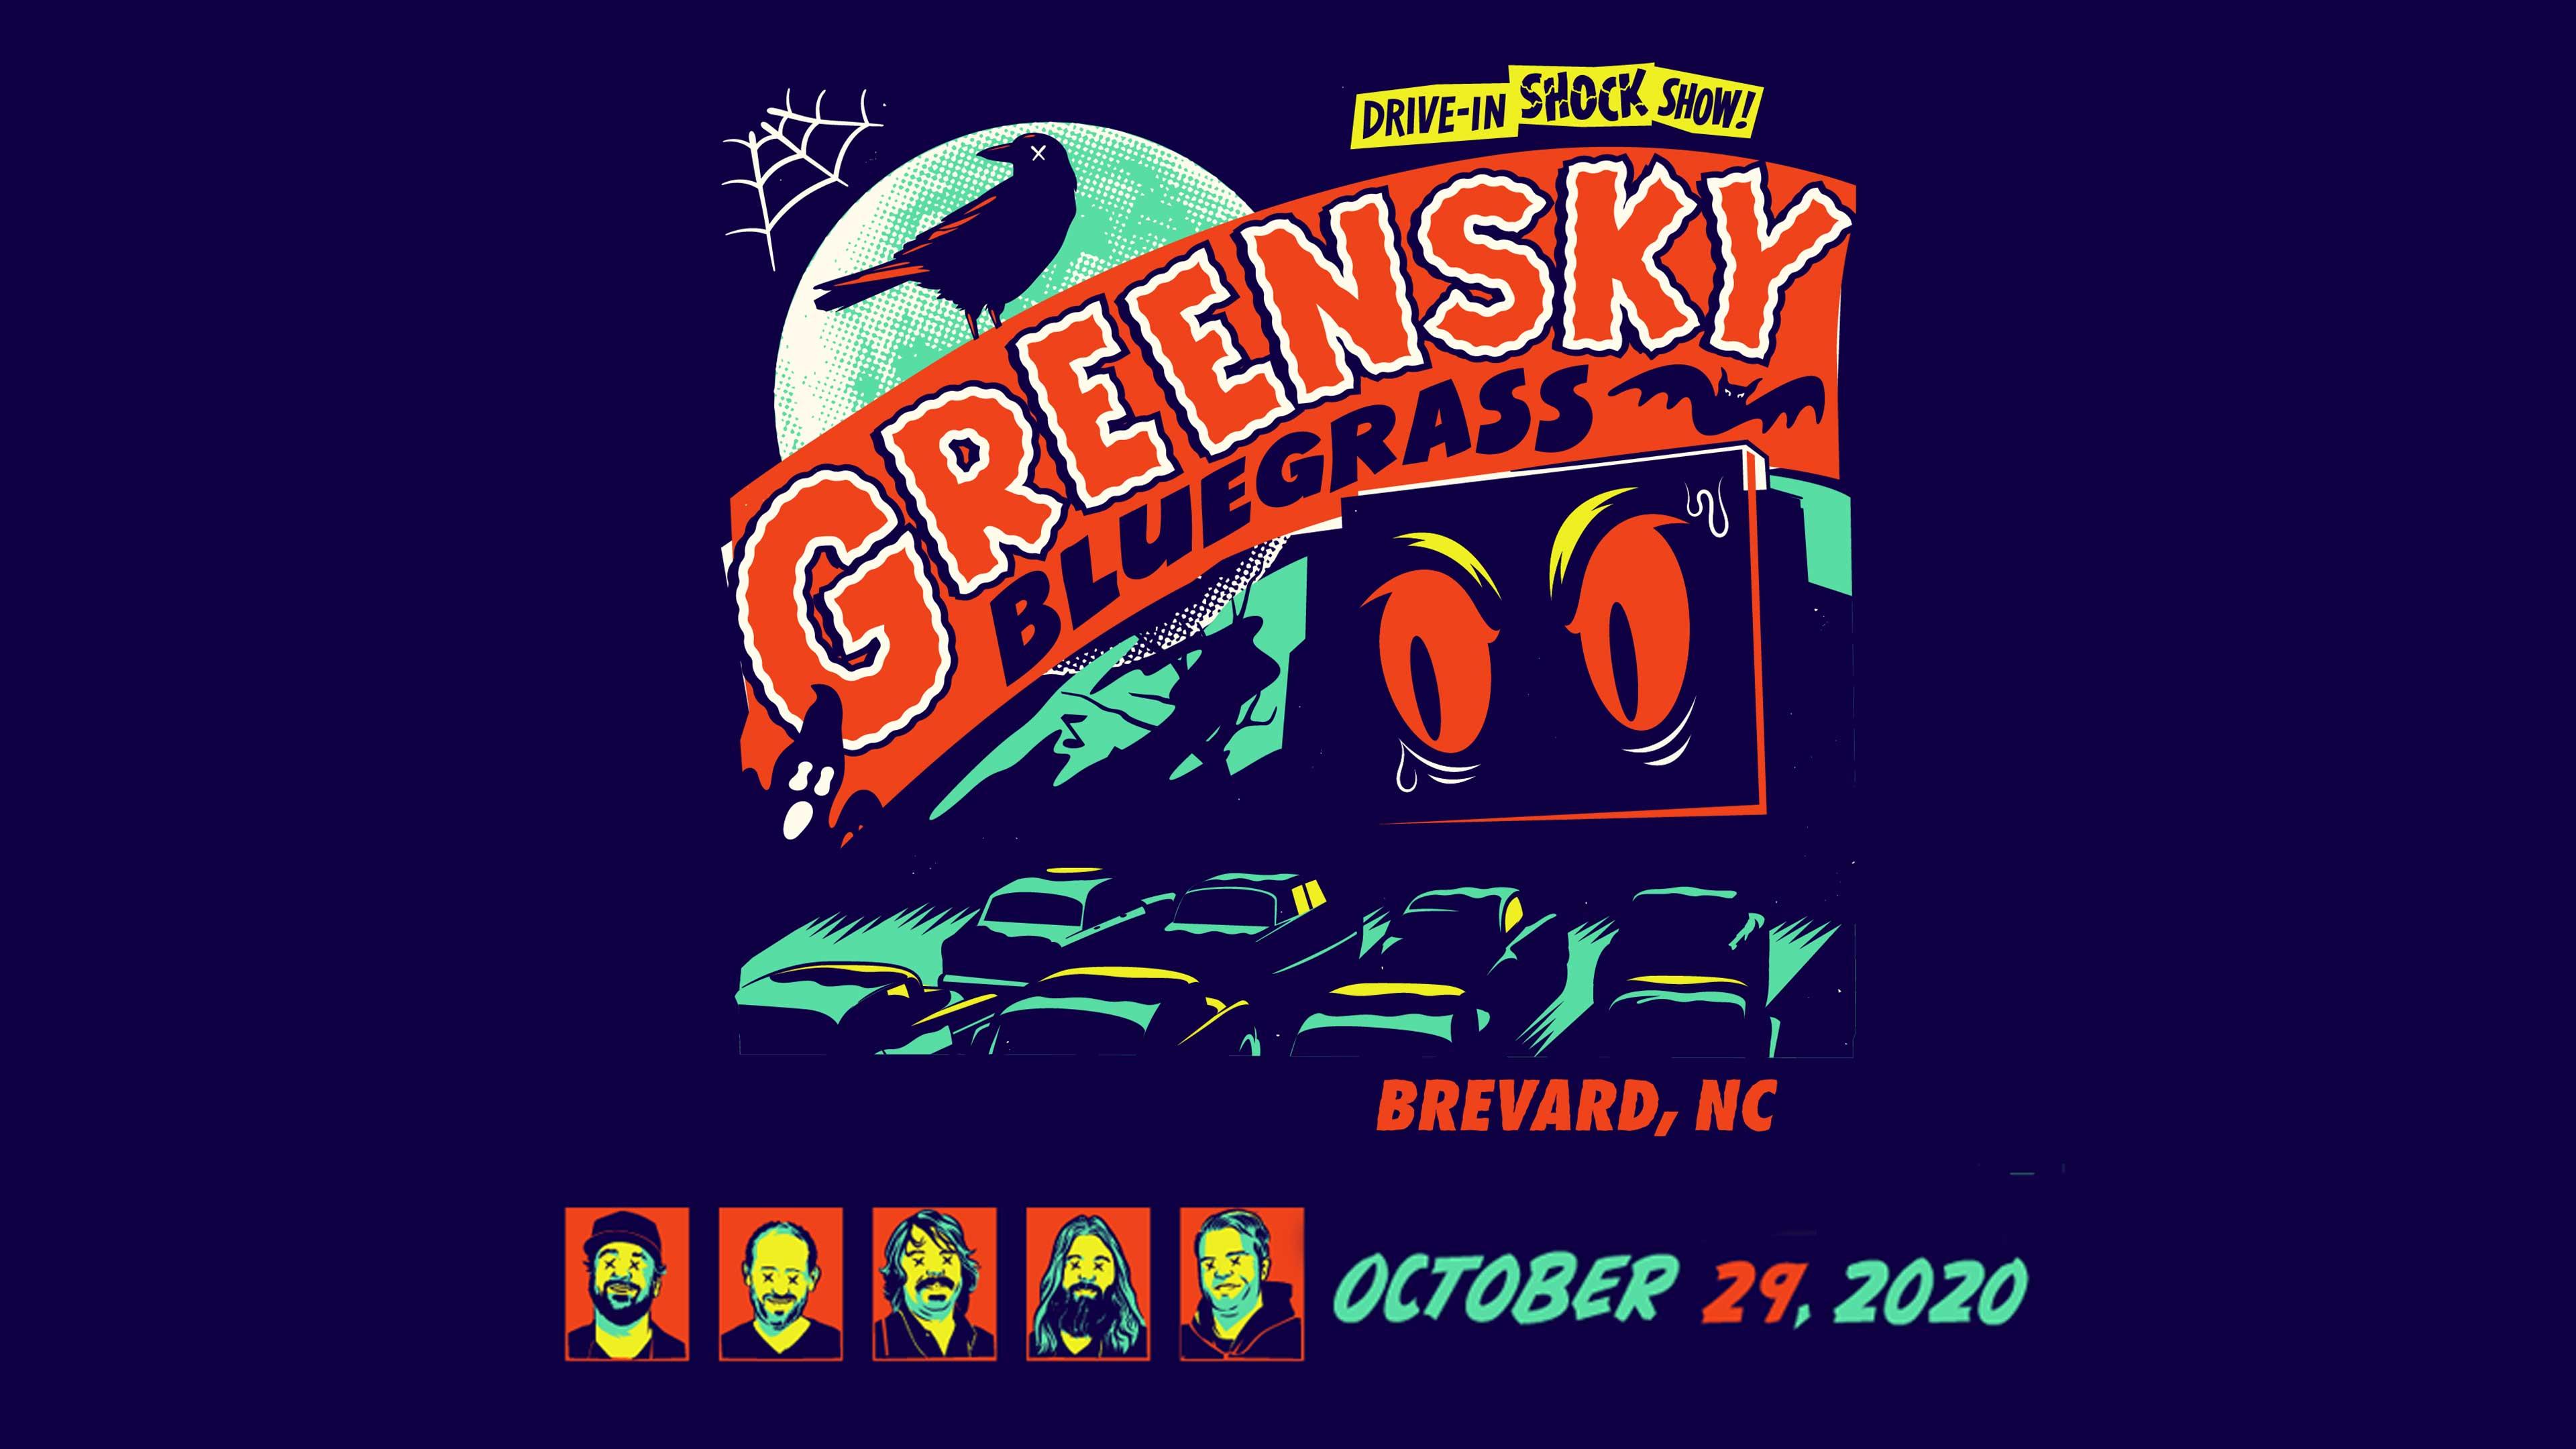 Greensky Bluegrass Halloween 2020 Greensky Bluegrass Halloween 2020   10/29/20   Greensky Bluegrass